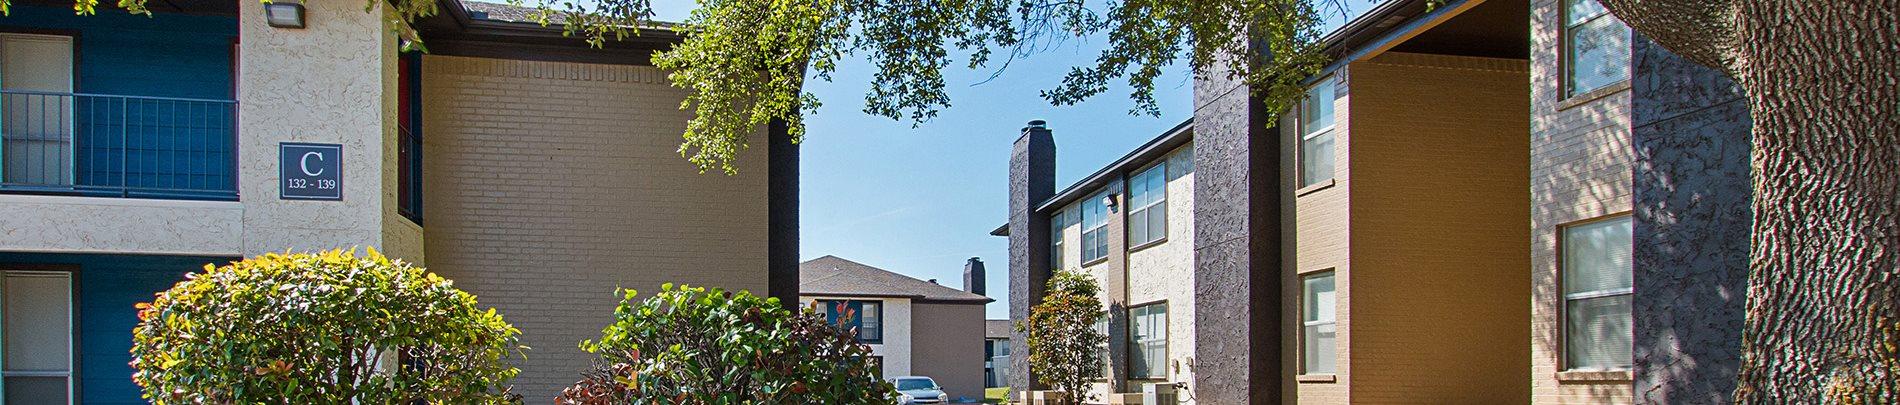 Building Exterior at Heritage Square Apartment Homes, Waco, Texas, TX